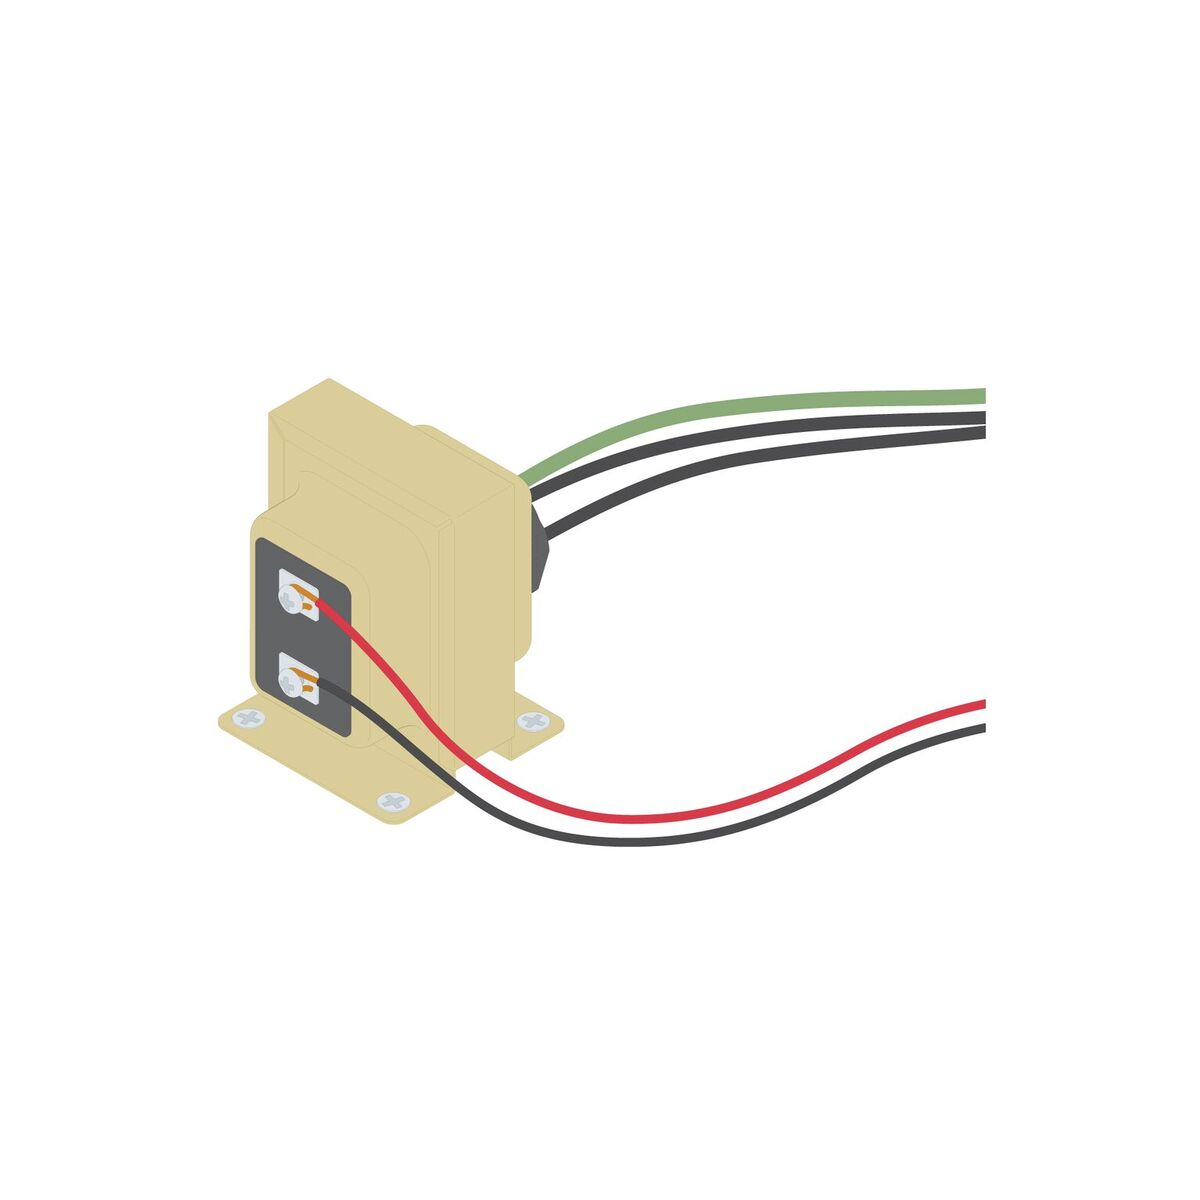 hight resolution of adapter setup 01 preview jpeg